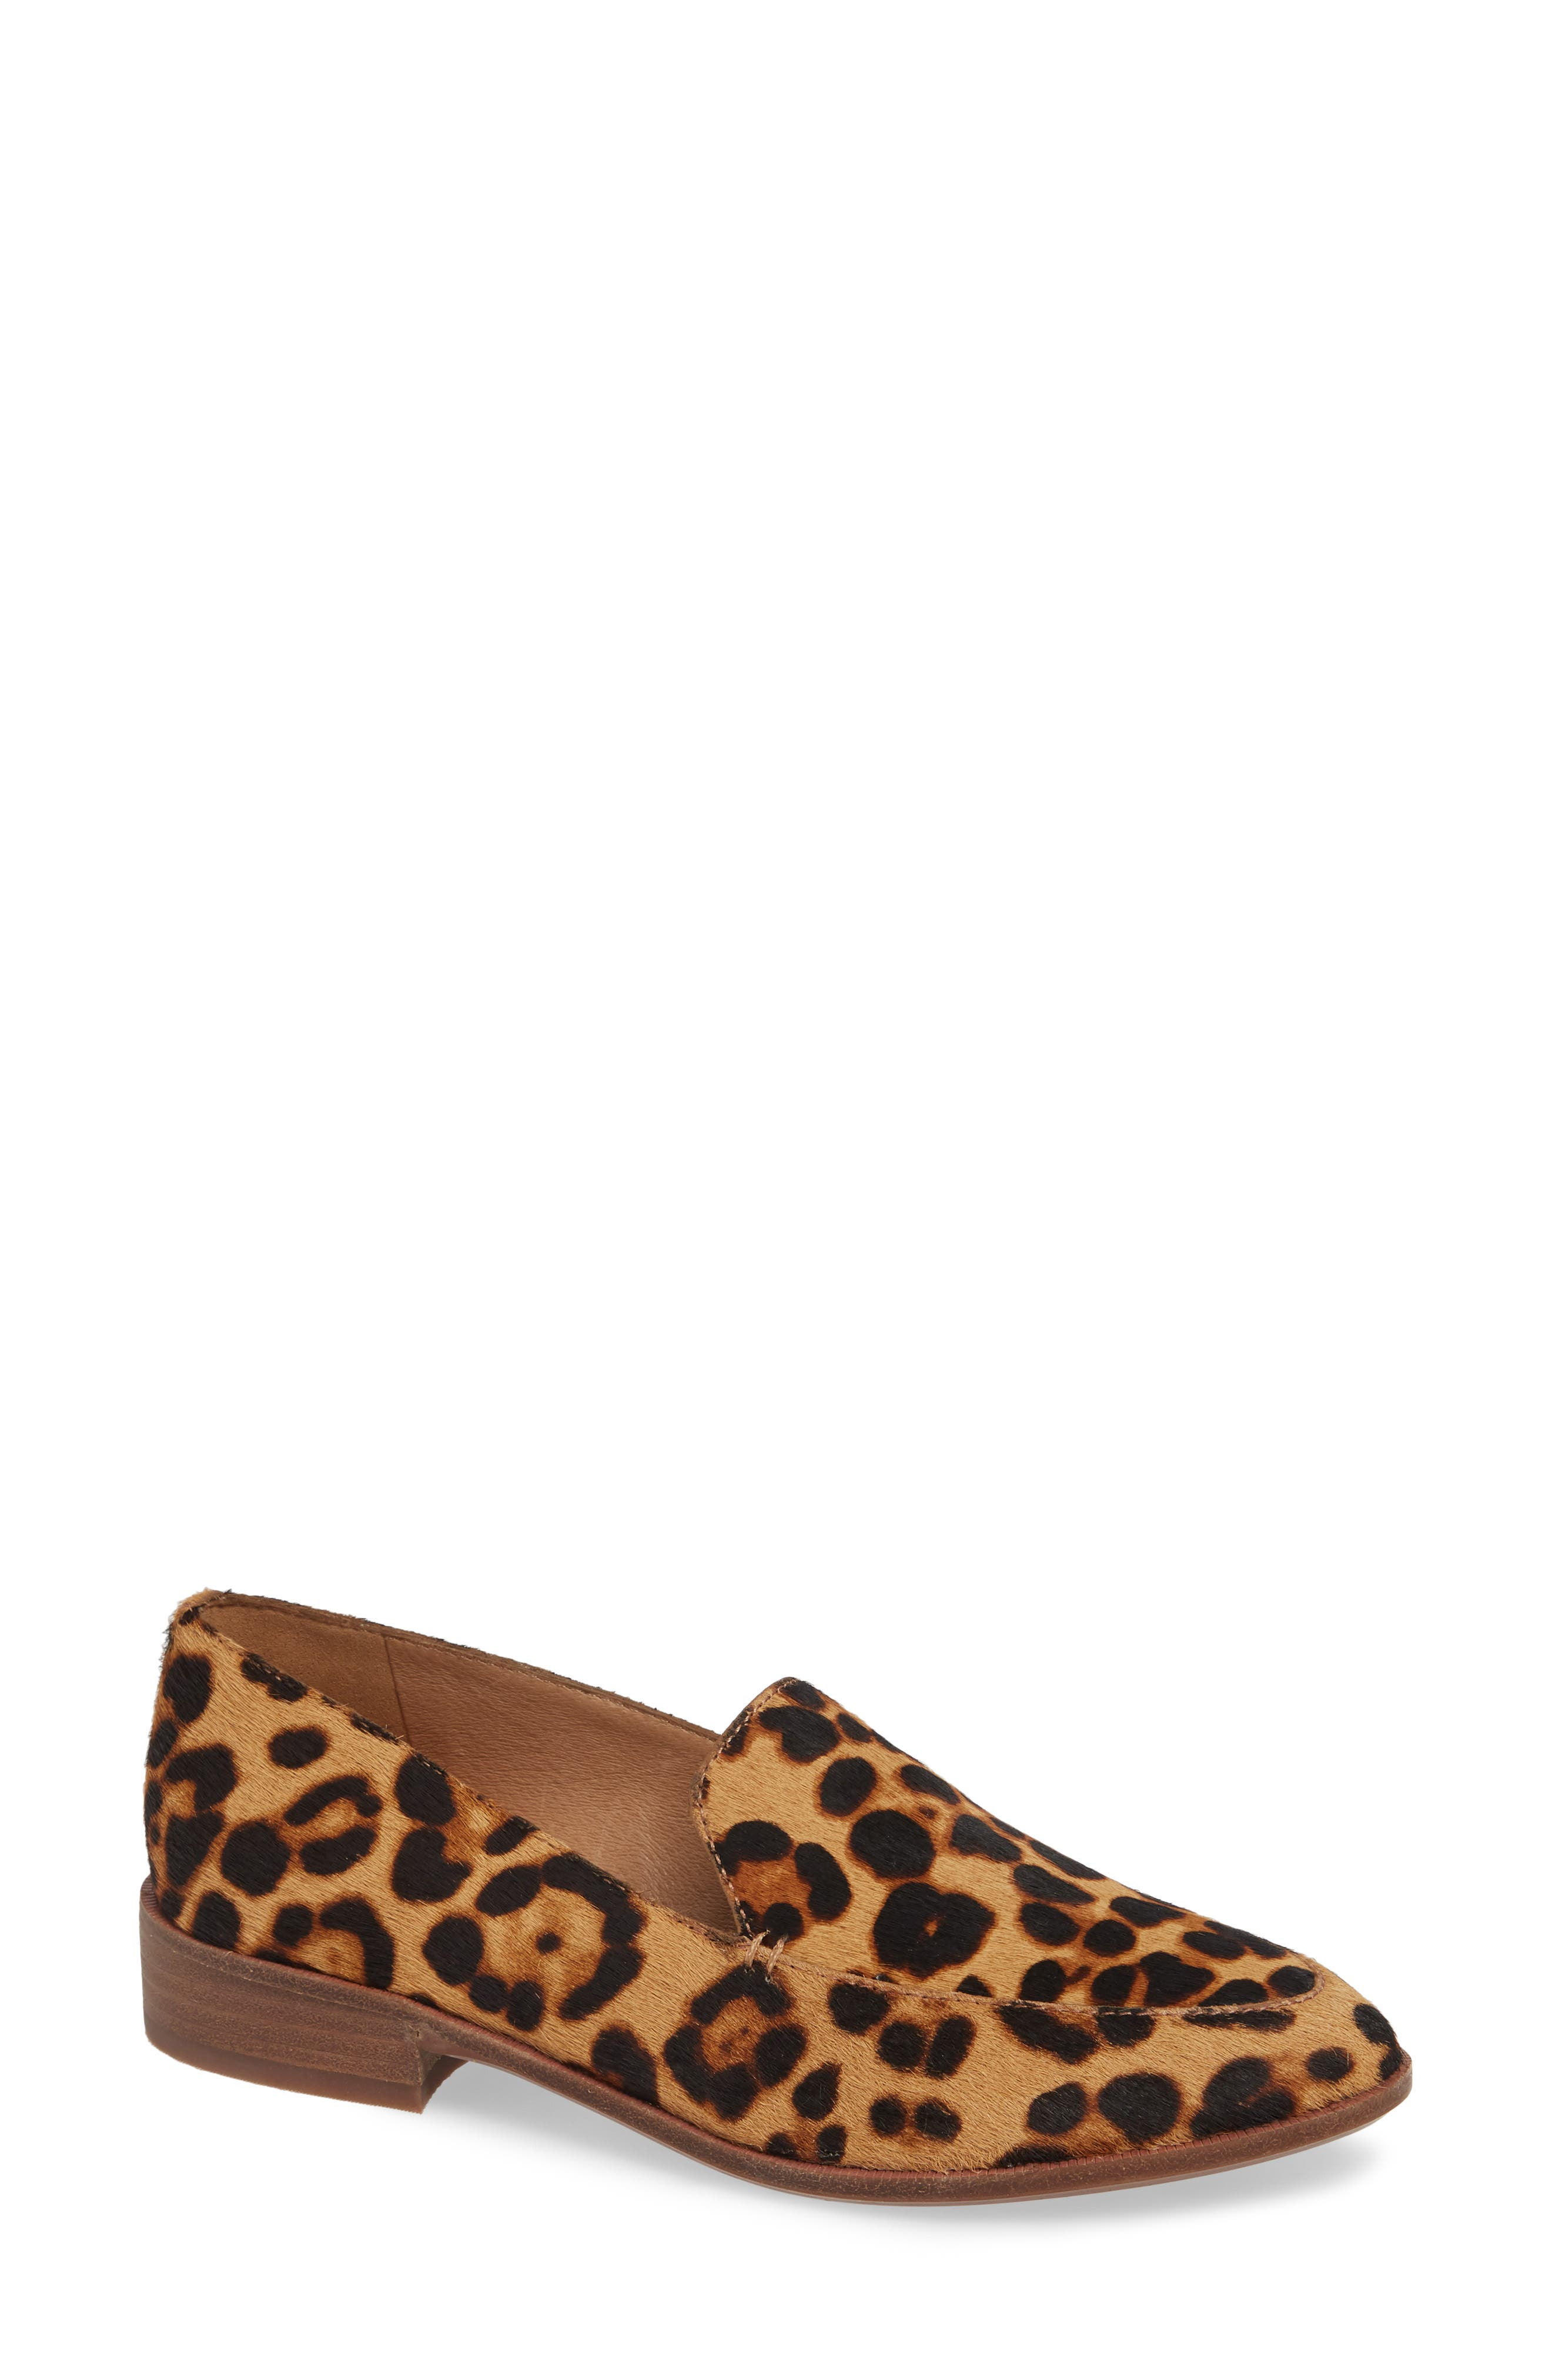 MADEWELL The Frances Genuine Calf Hair Loafer, Main, color, TRUFFLE MULTI LEOPARD CALFHAIR